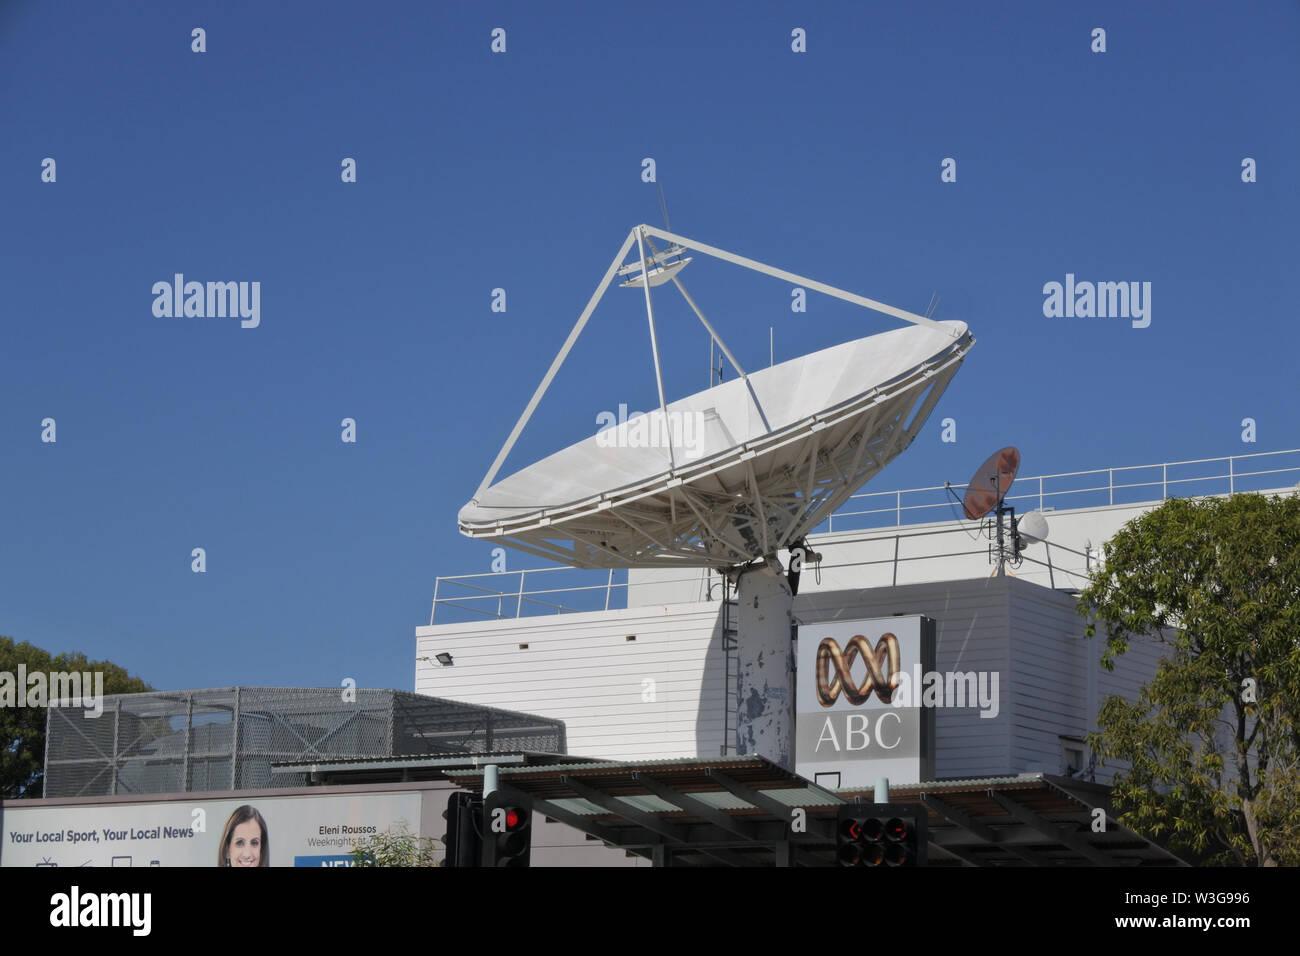 Abc News Stock Photos & Abc News Stock Images - Alamy